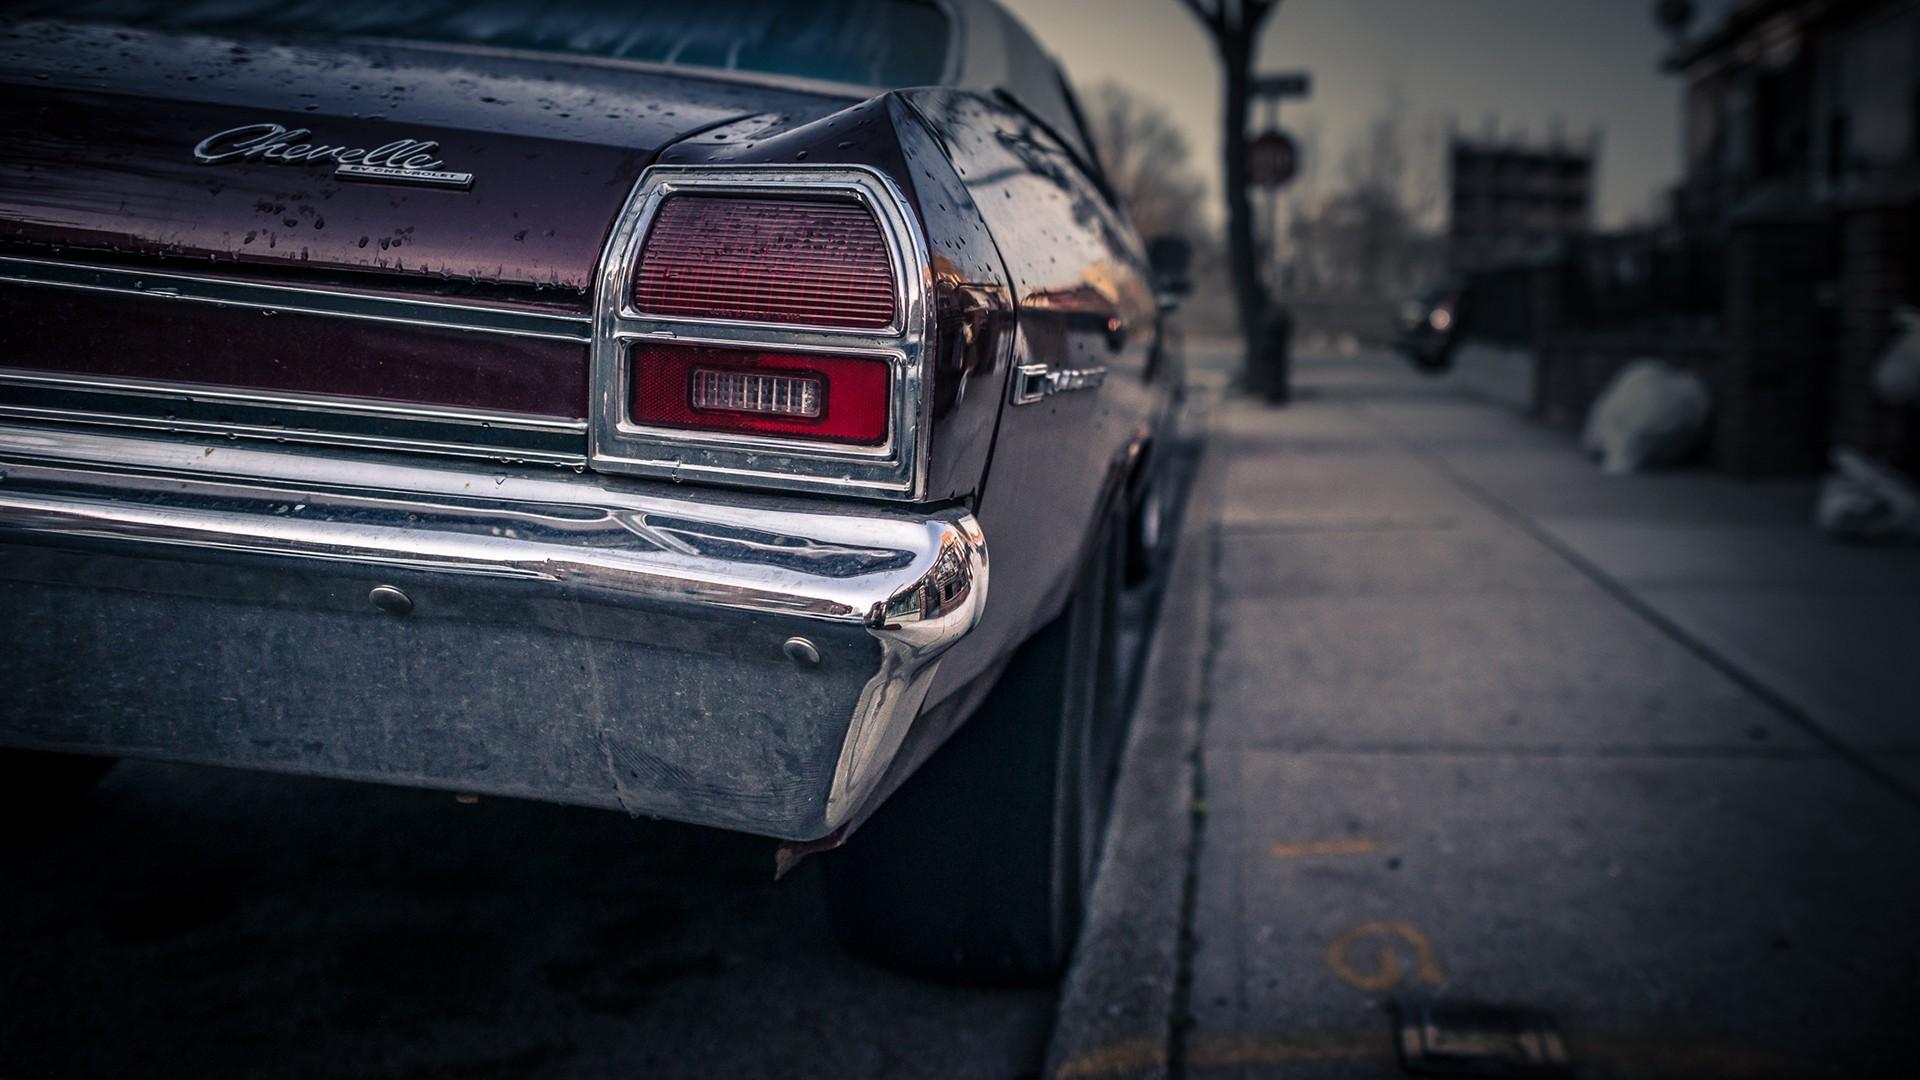 Wallpaper Monochrome Closeup Chevrolet Chevelle Sedan Wheel